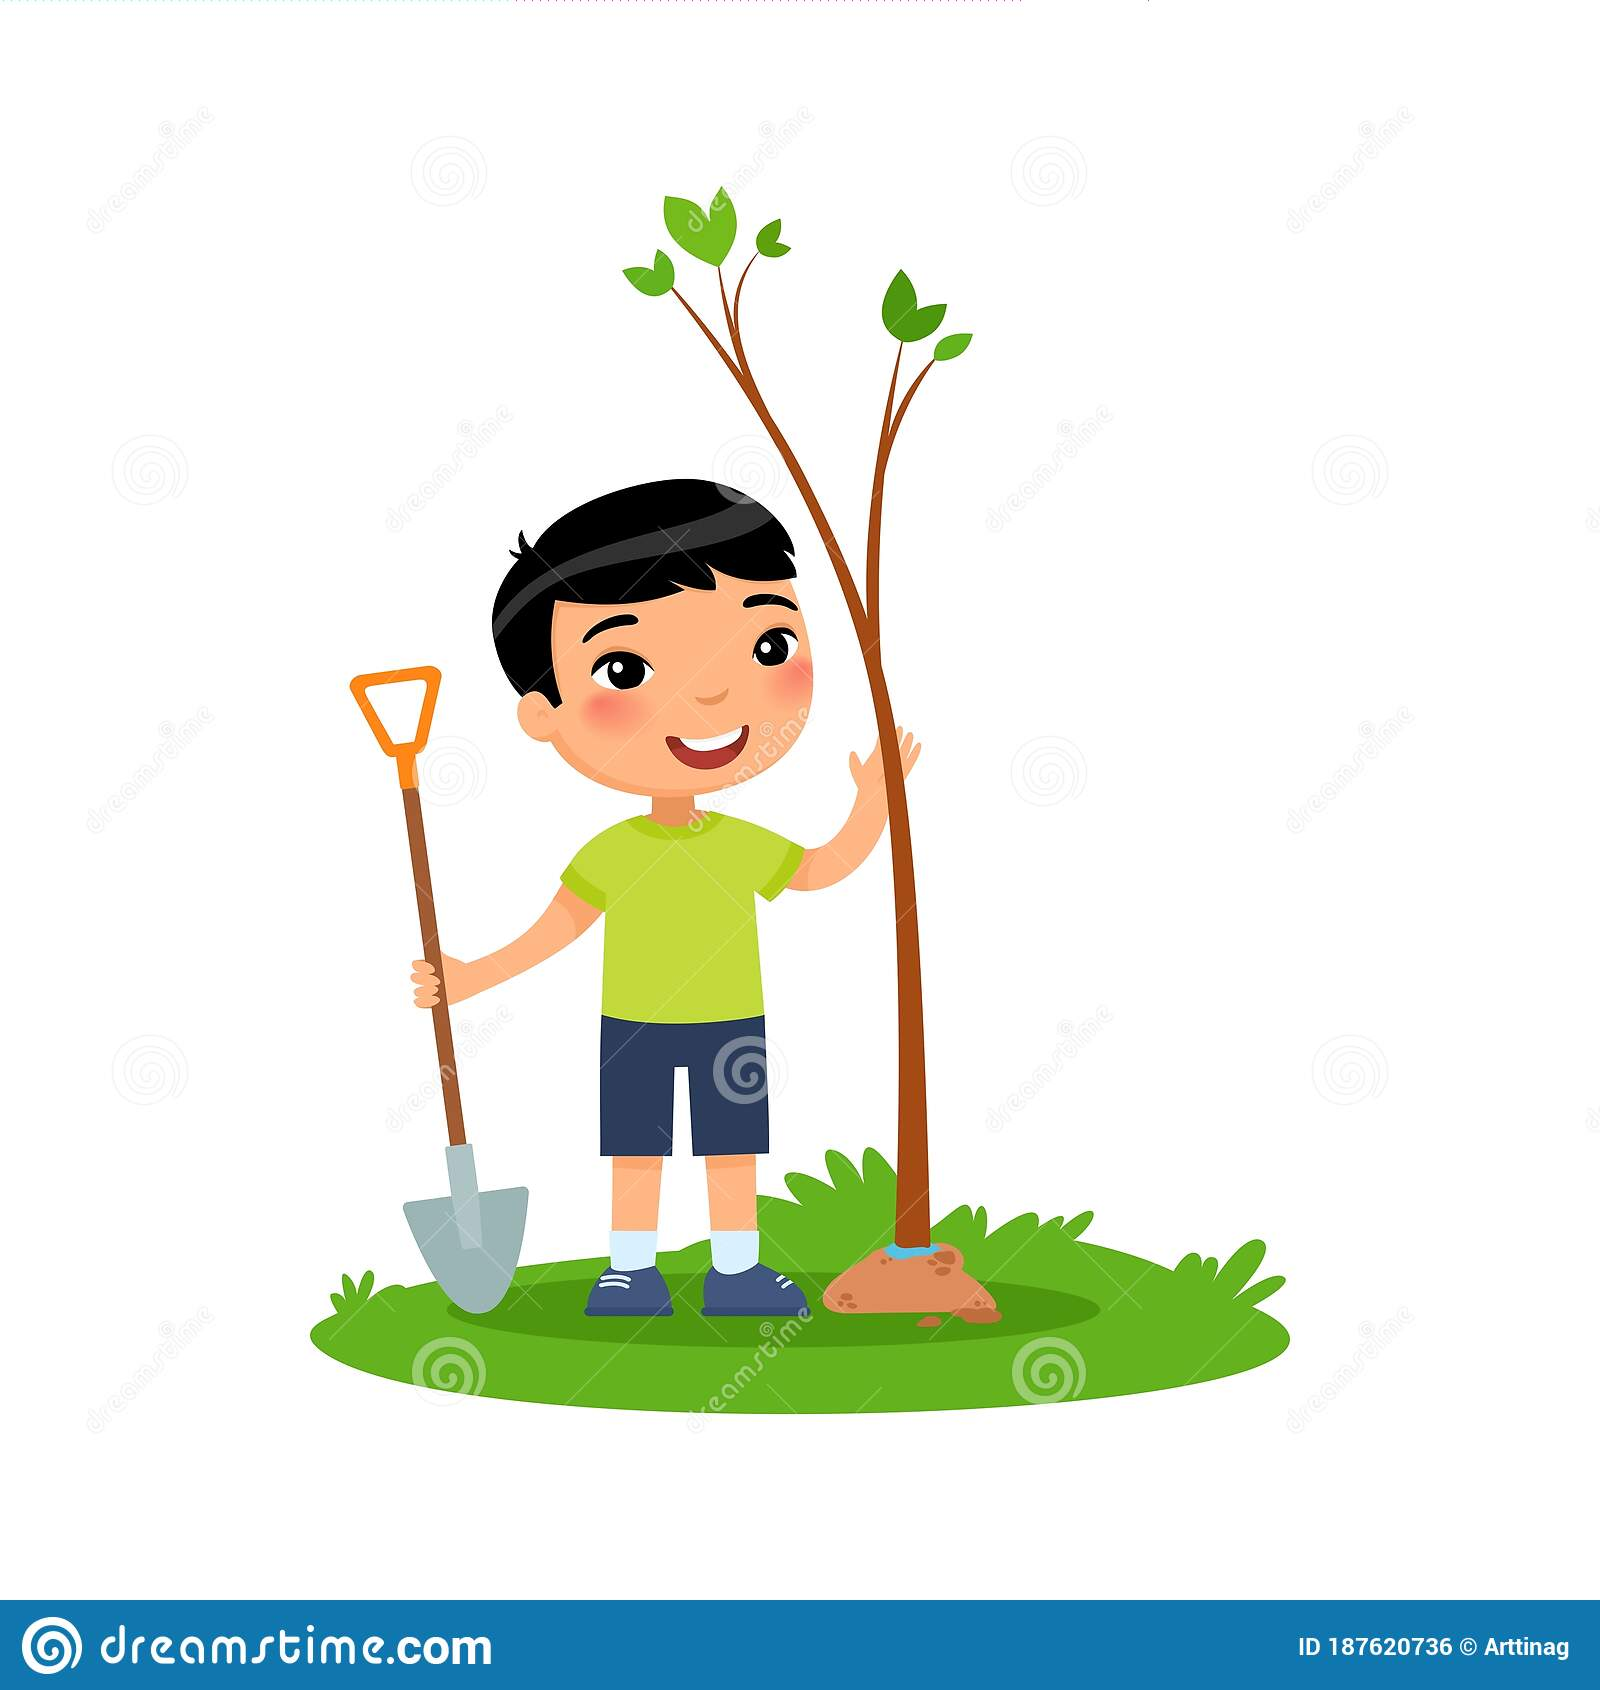 Cartoon Boy Planting Tree Stock Illustrations 305 Cartoon Boy Planting Tree Stock Illustrations Vectors Clipart Dreamstime Tree young adults, new braunfels, texas. dreamstime com